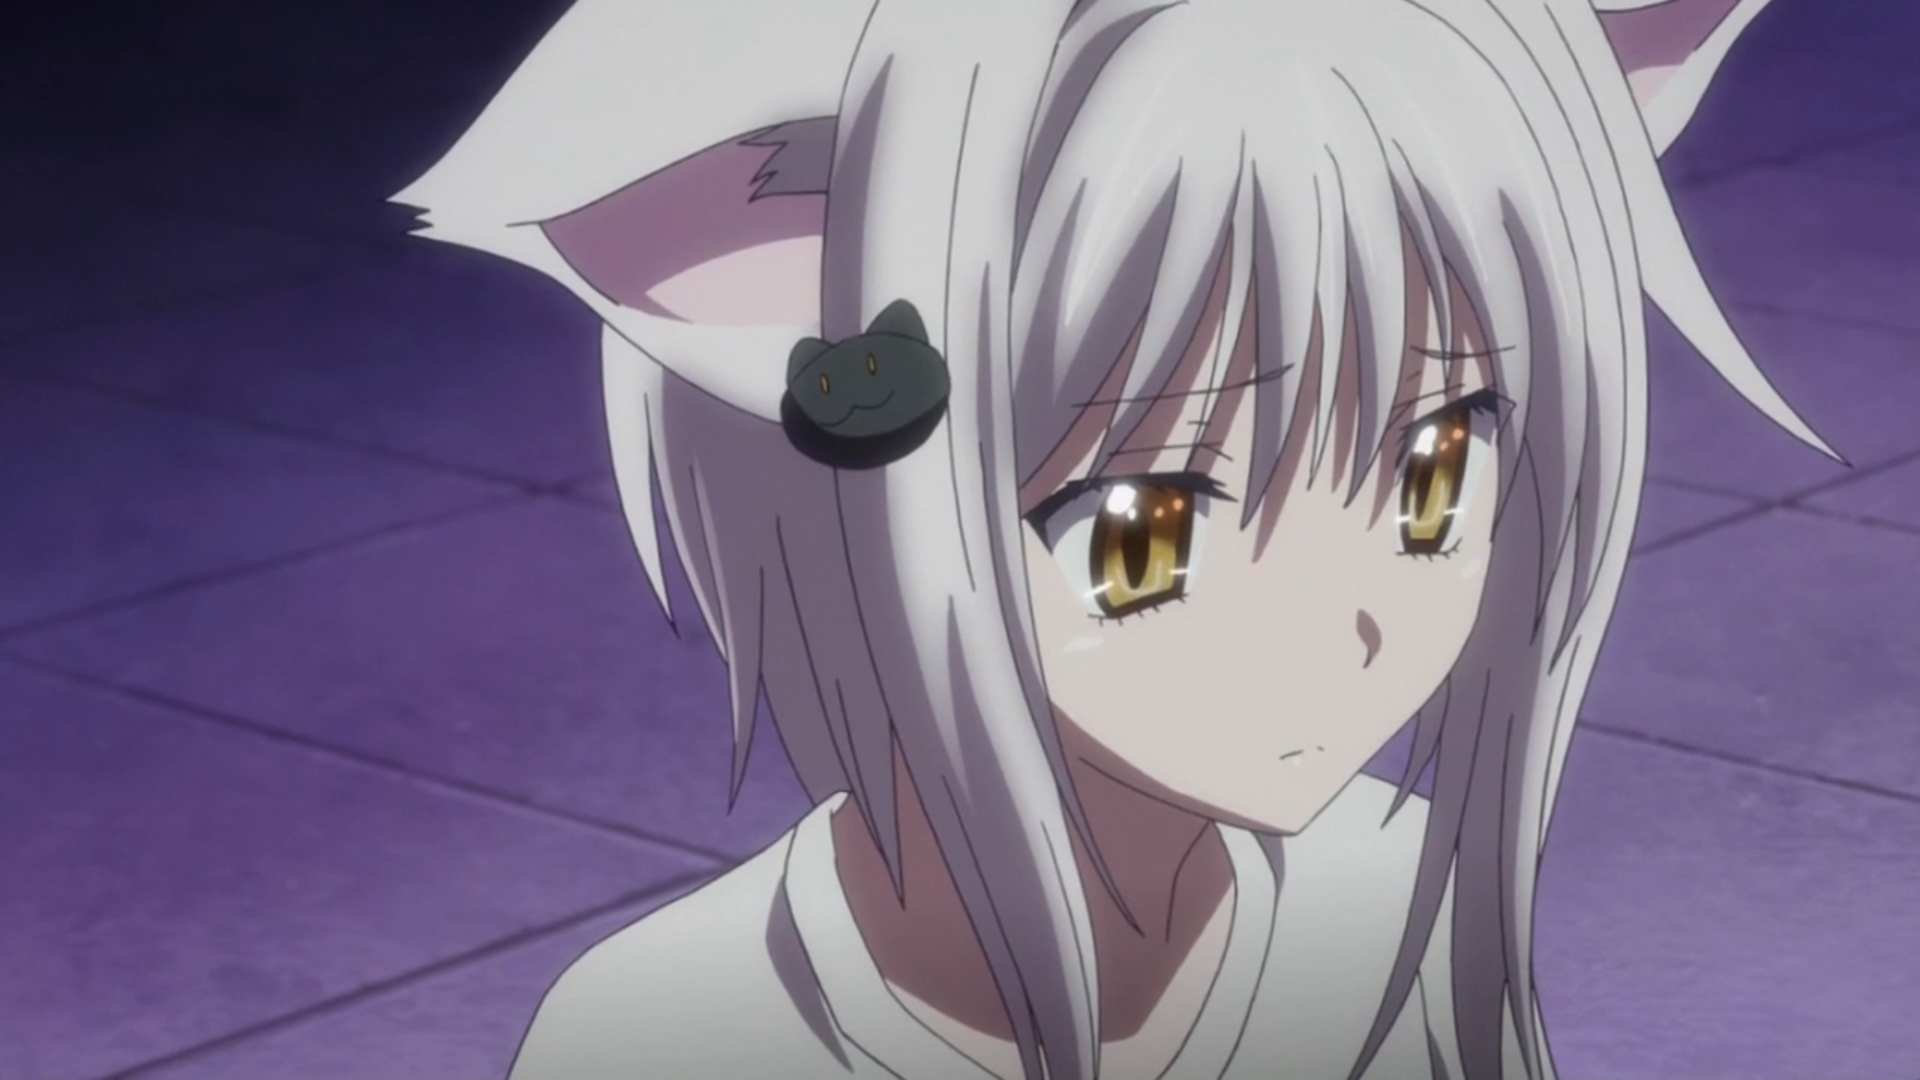 high school dxd koneko cat | High School DxD BorN episode 2: Furry ...